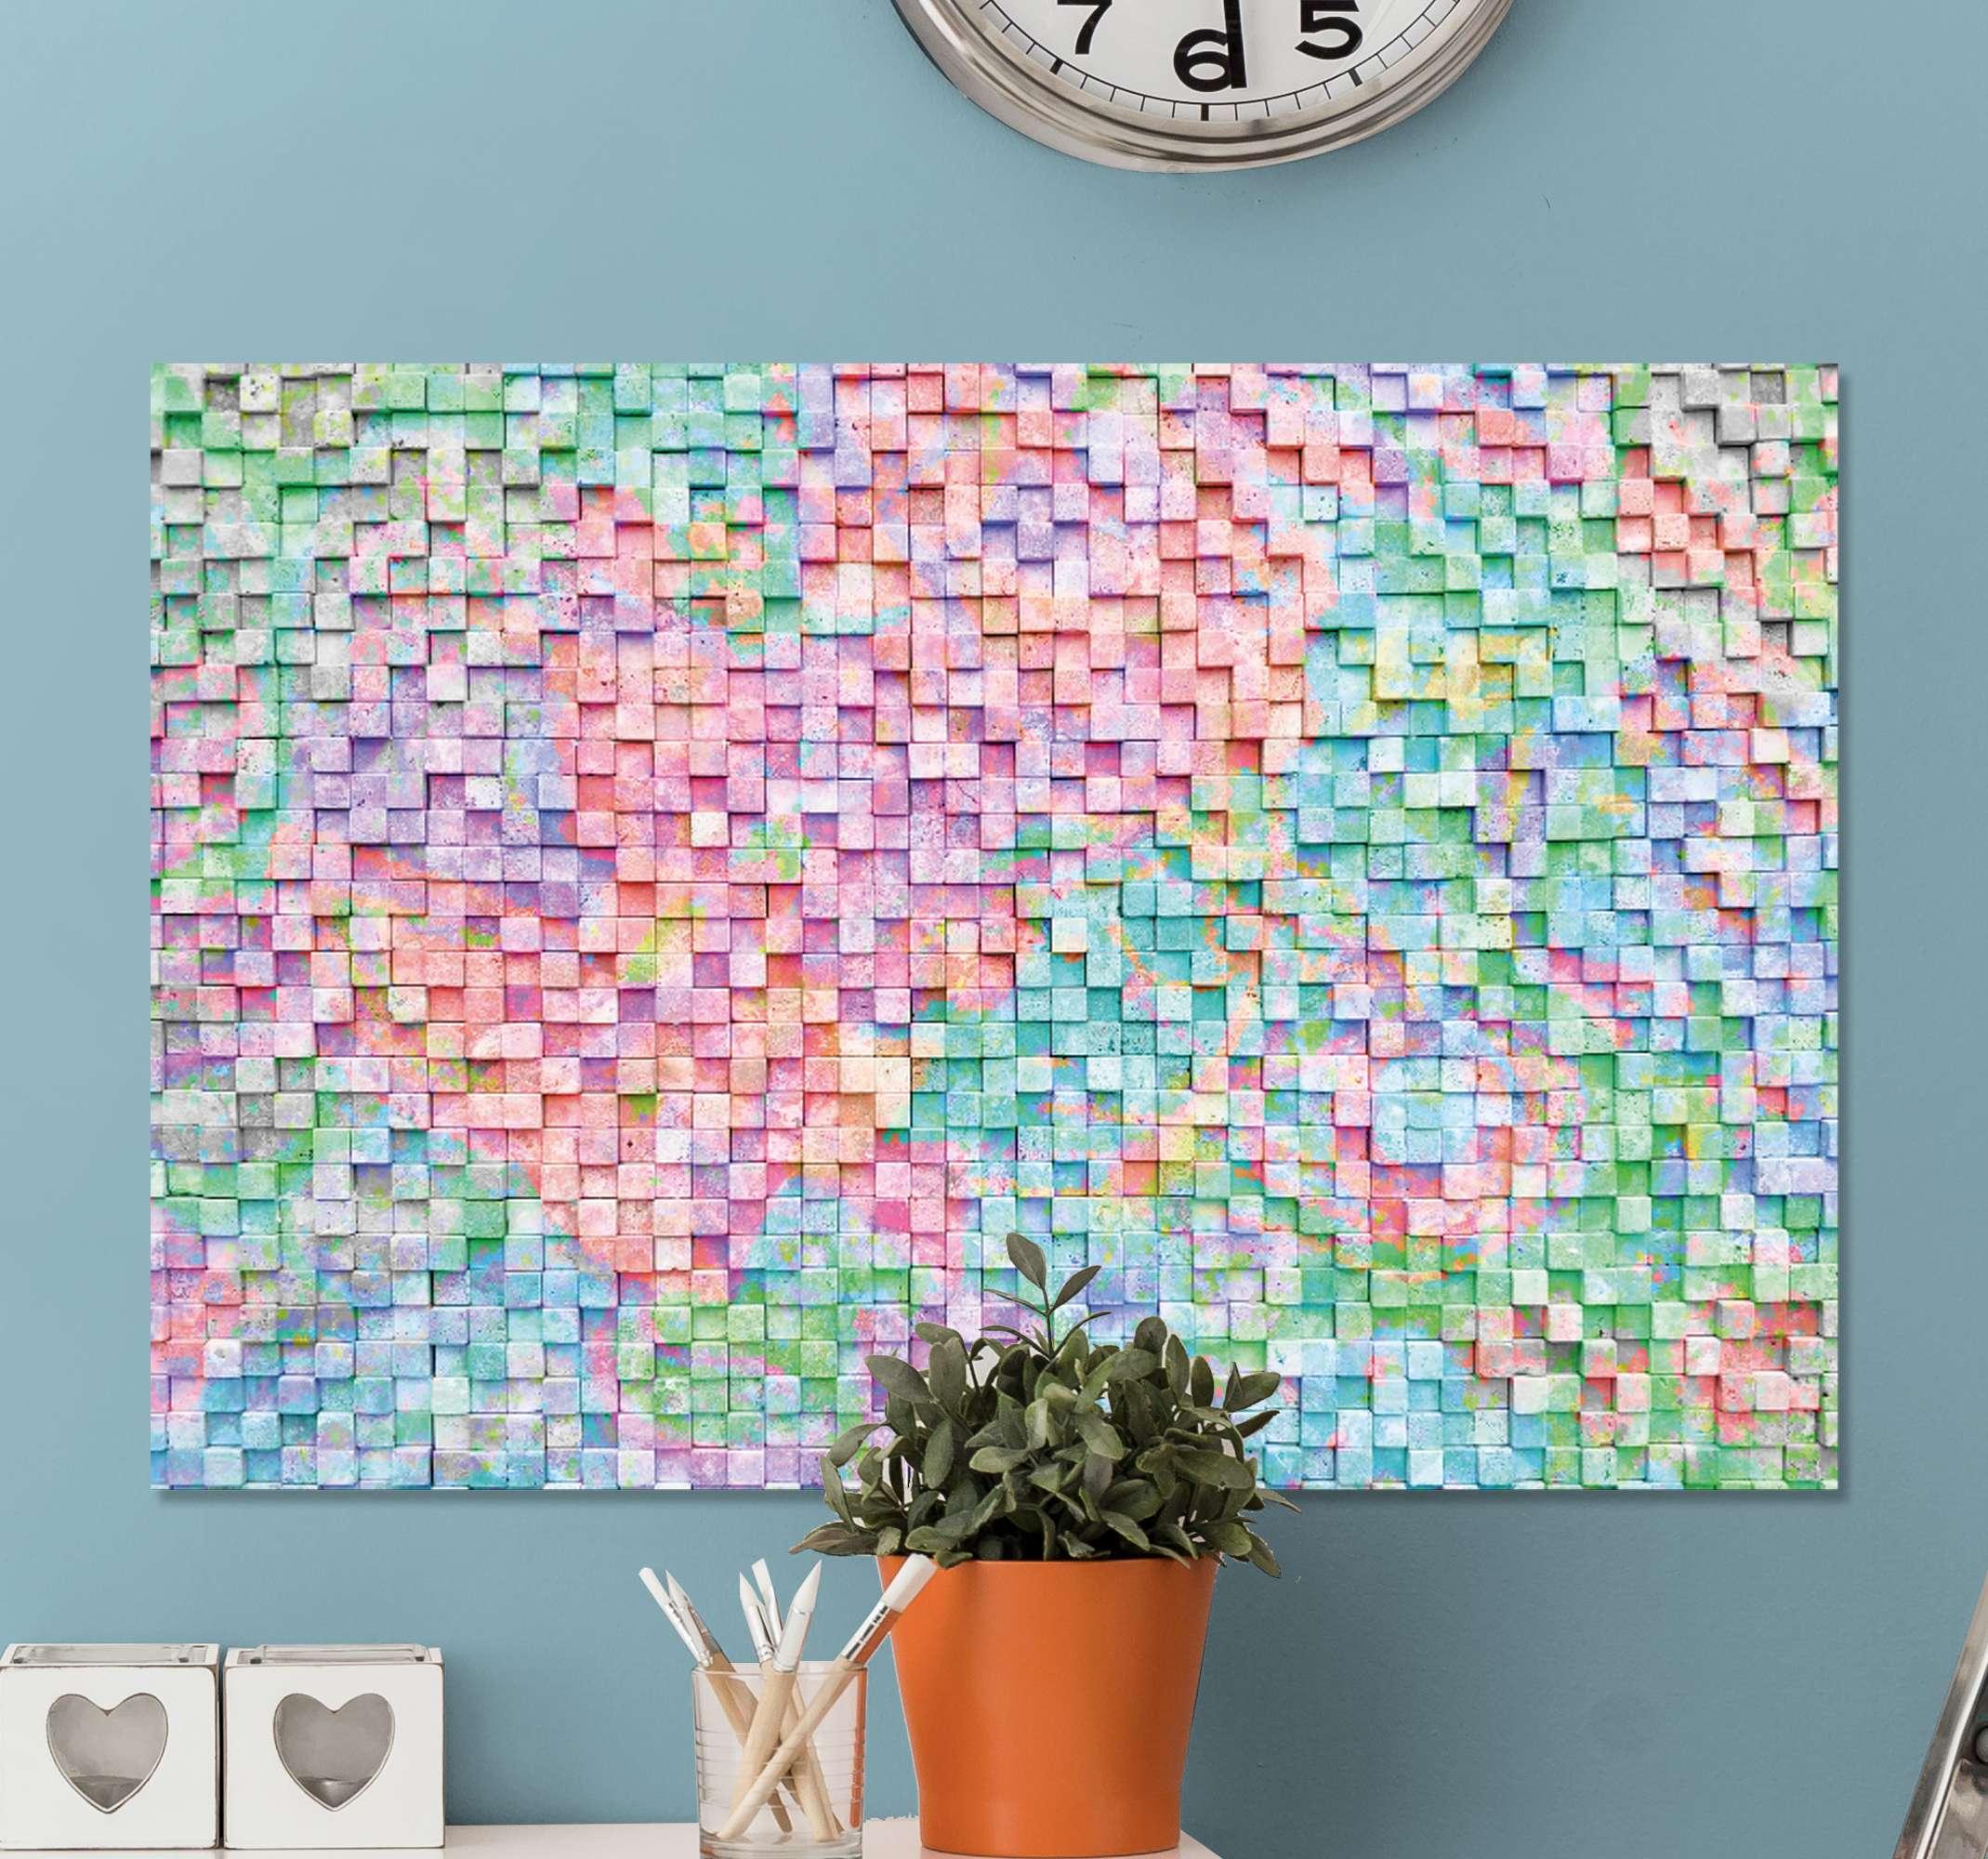 TenStickers. τετράγωνο μωσαϊκό καμβά. αγοράστε αυτήν την απίστευτη εκτύπωση μωσαϊκού σε καμβά με ποικιλία χρωμάτων για να ενημερώσετε τους τοίχους σας σήμερα! διαθέσιμες εκπτώσεις.